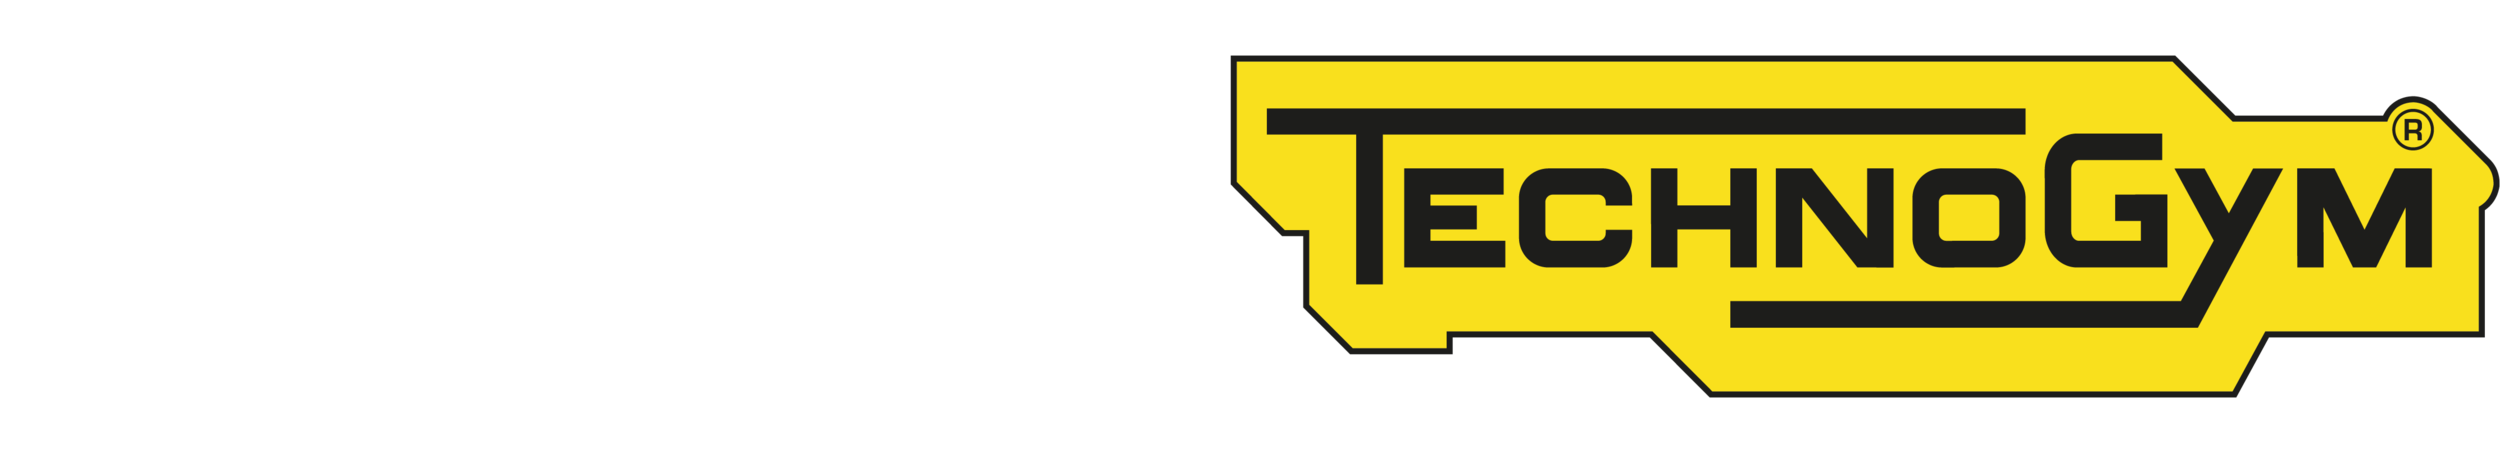 OFFICIAL_Distributor logo (hor).png